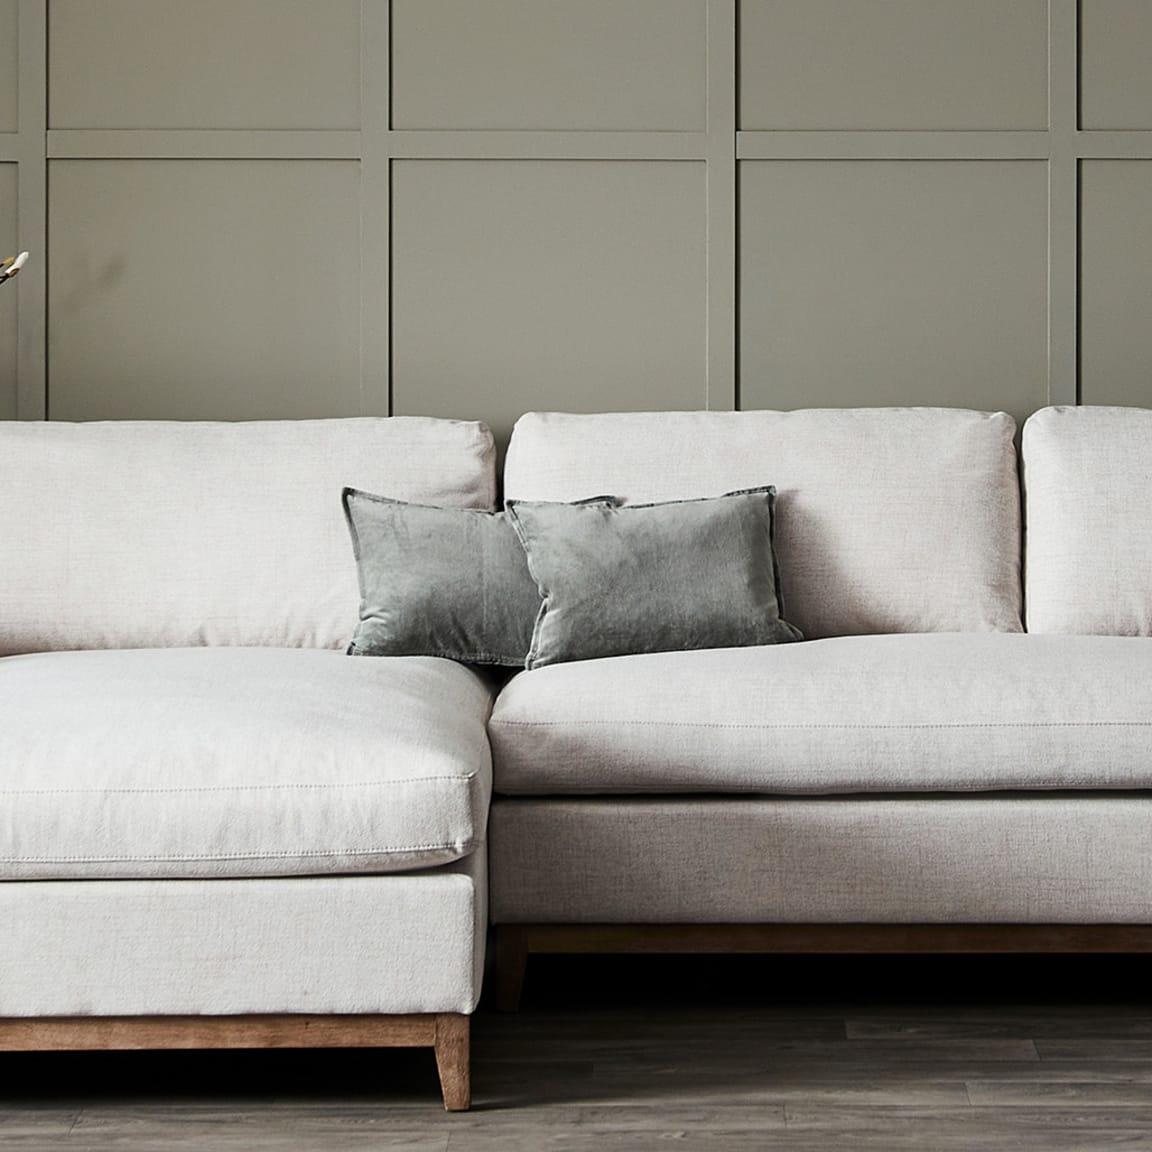 Provincial Home Living: Save $1500 on the Malibu sofa bed*